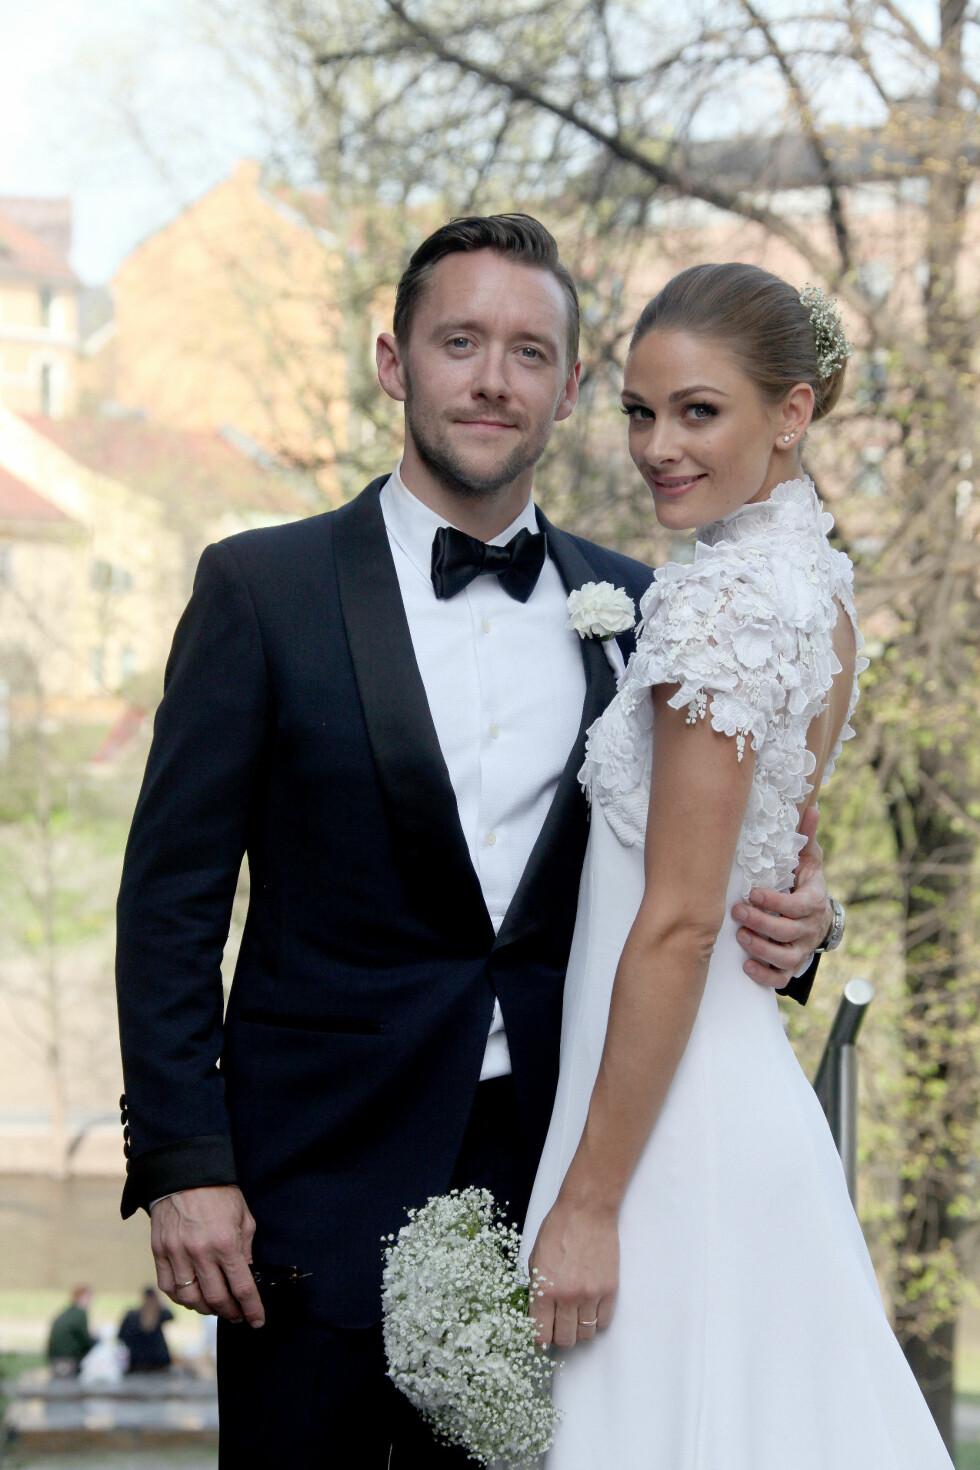 GIFT: Lørdag giftet Jenny Skavlan og Thomas Gullestad seg i Oslo sentrum.  Foto: FameFlynet Norway